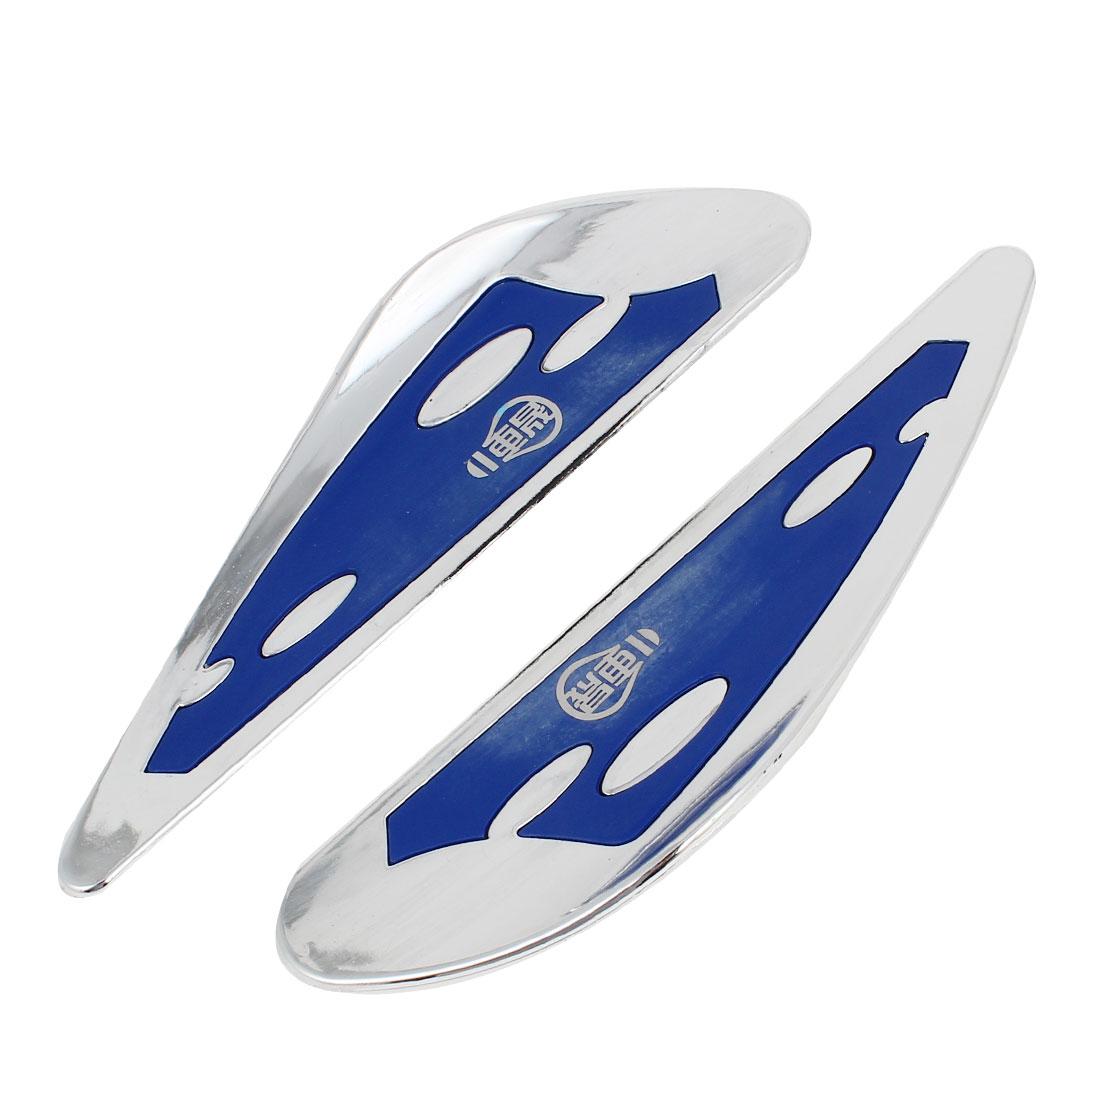 2 Pcs Car Auto Blue Silver Tone Windshield Wiper Wing 18cm x 4.5cm